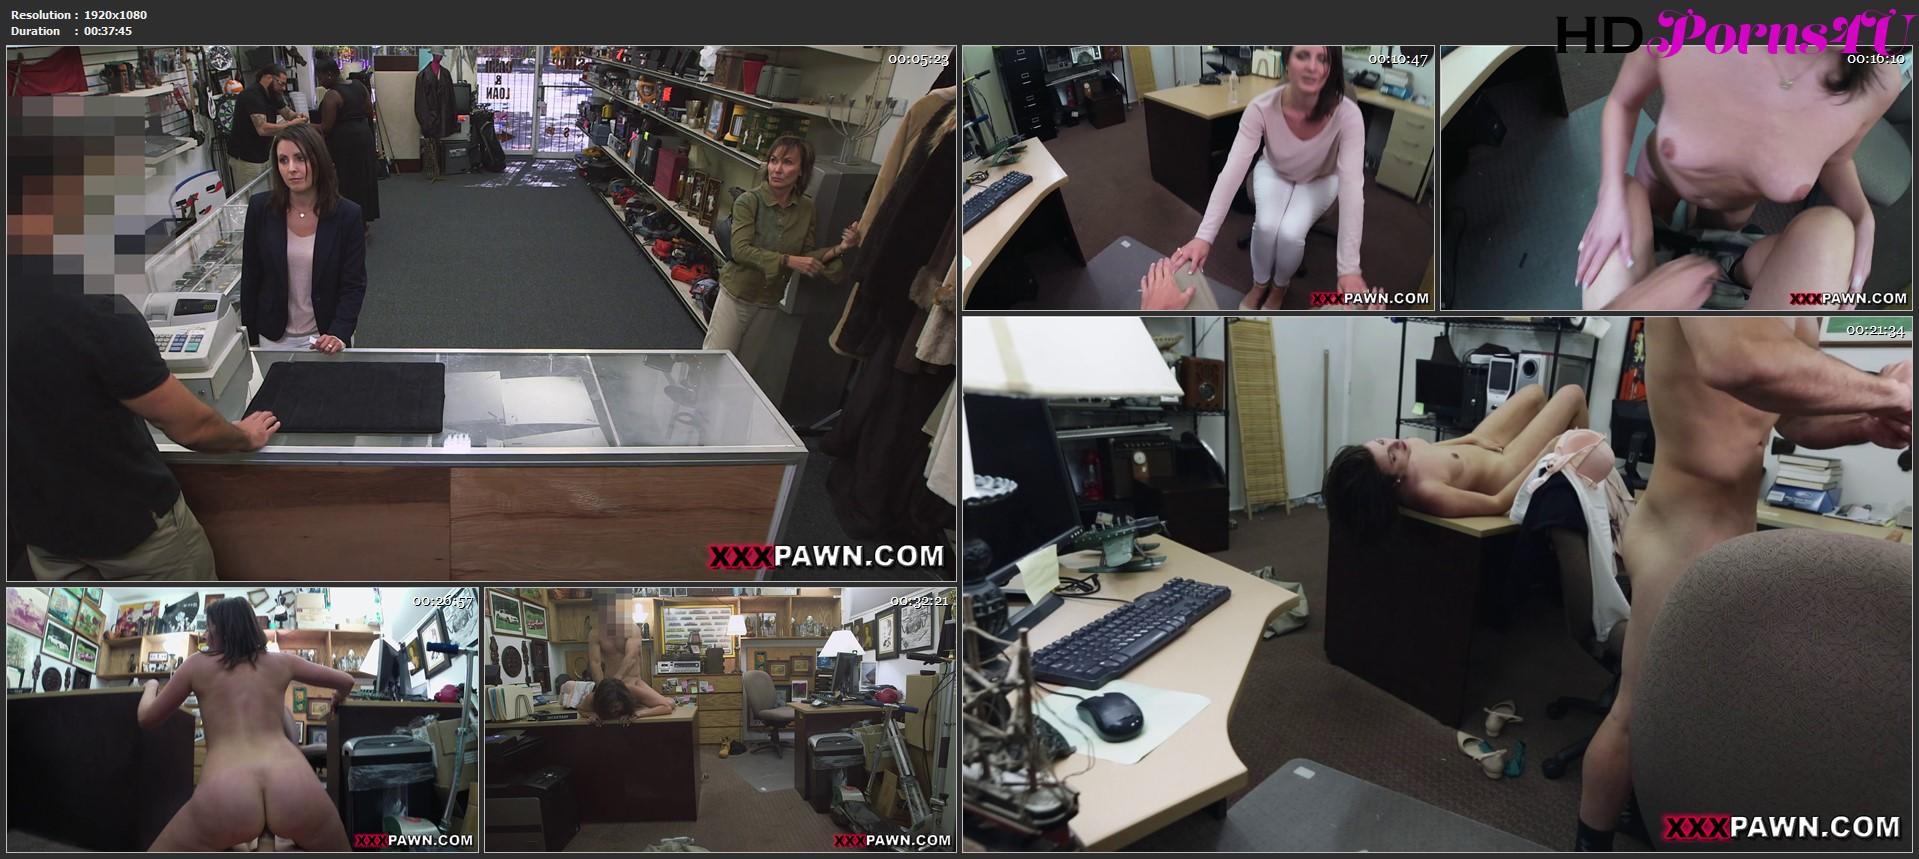 Xrated pawn shop bbw anal